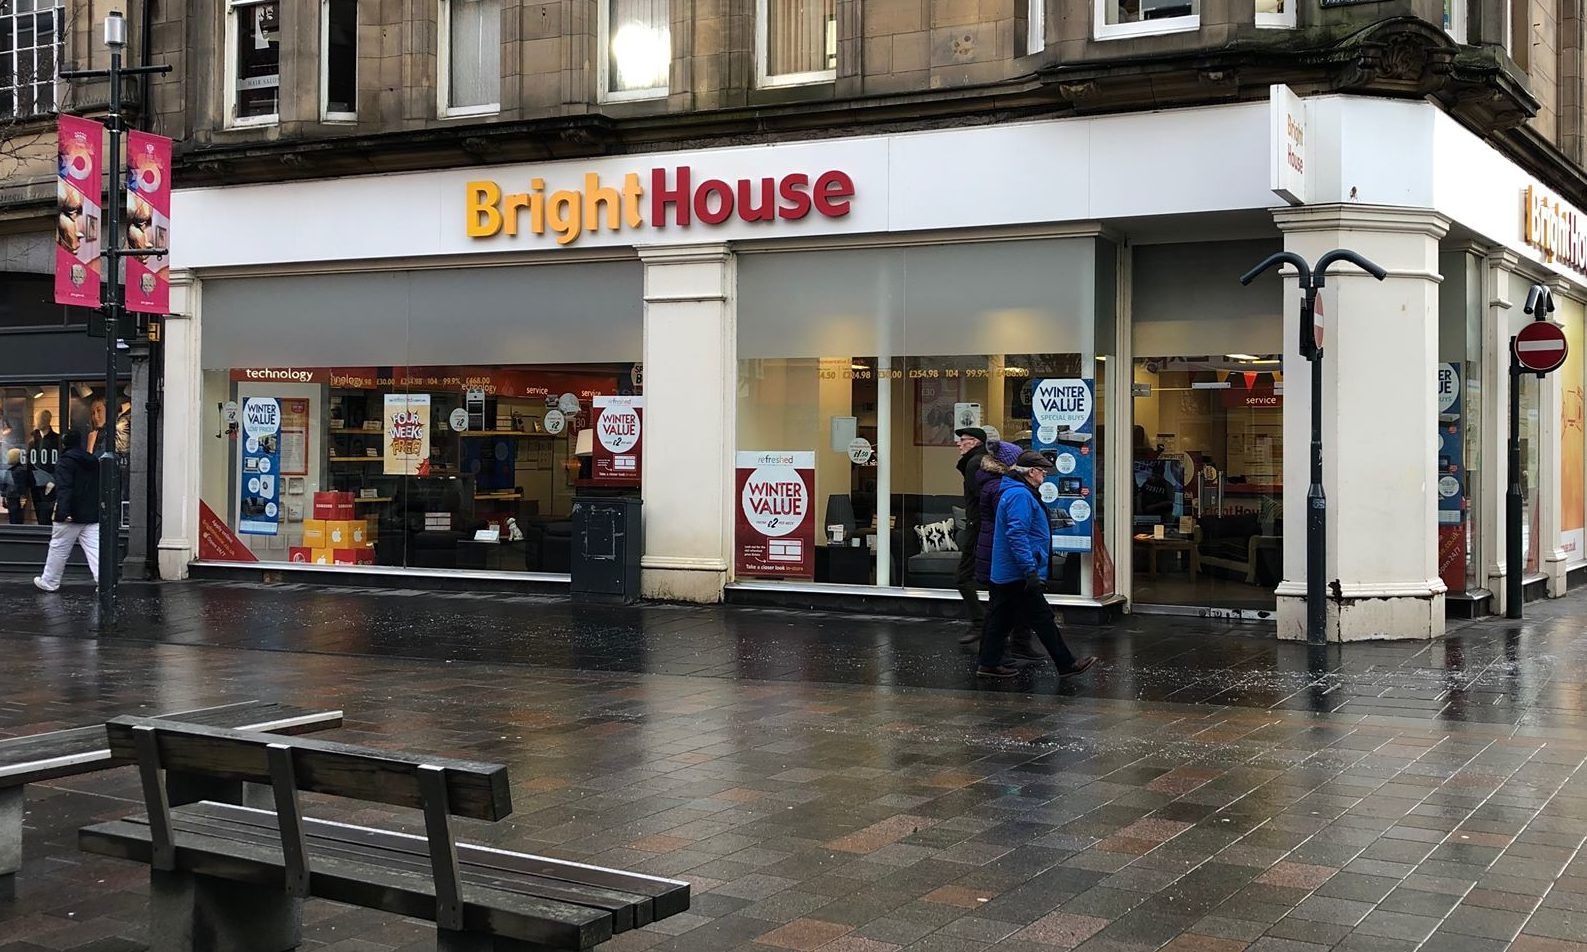 Bright House in Perth